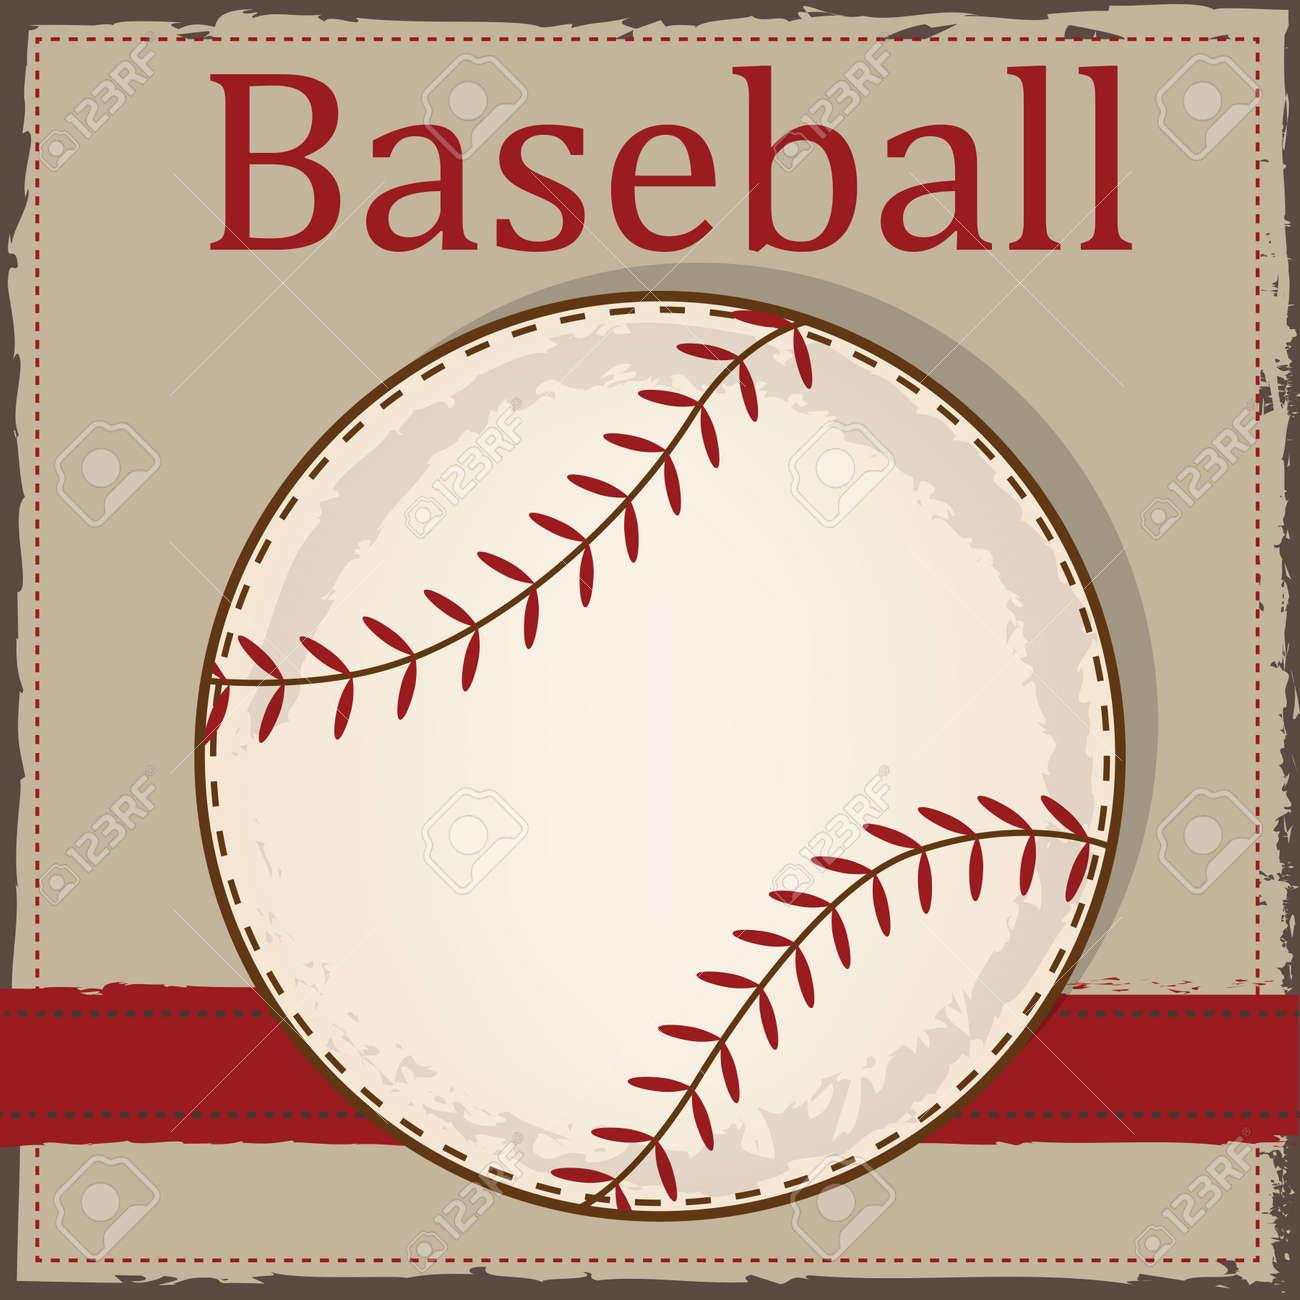 Vintage Baseball Layout For Scrapbooking Cards Or Backgrounds